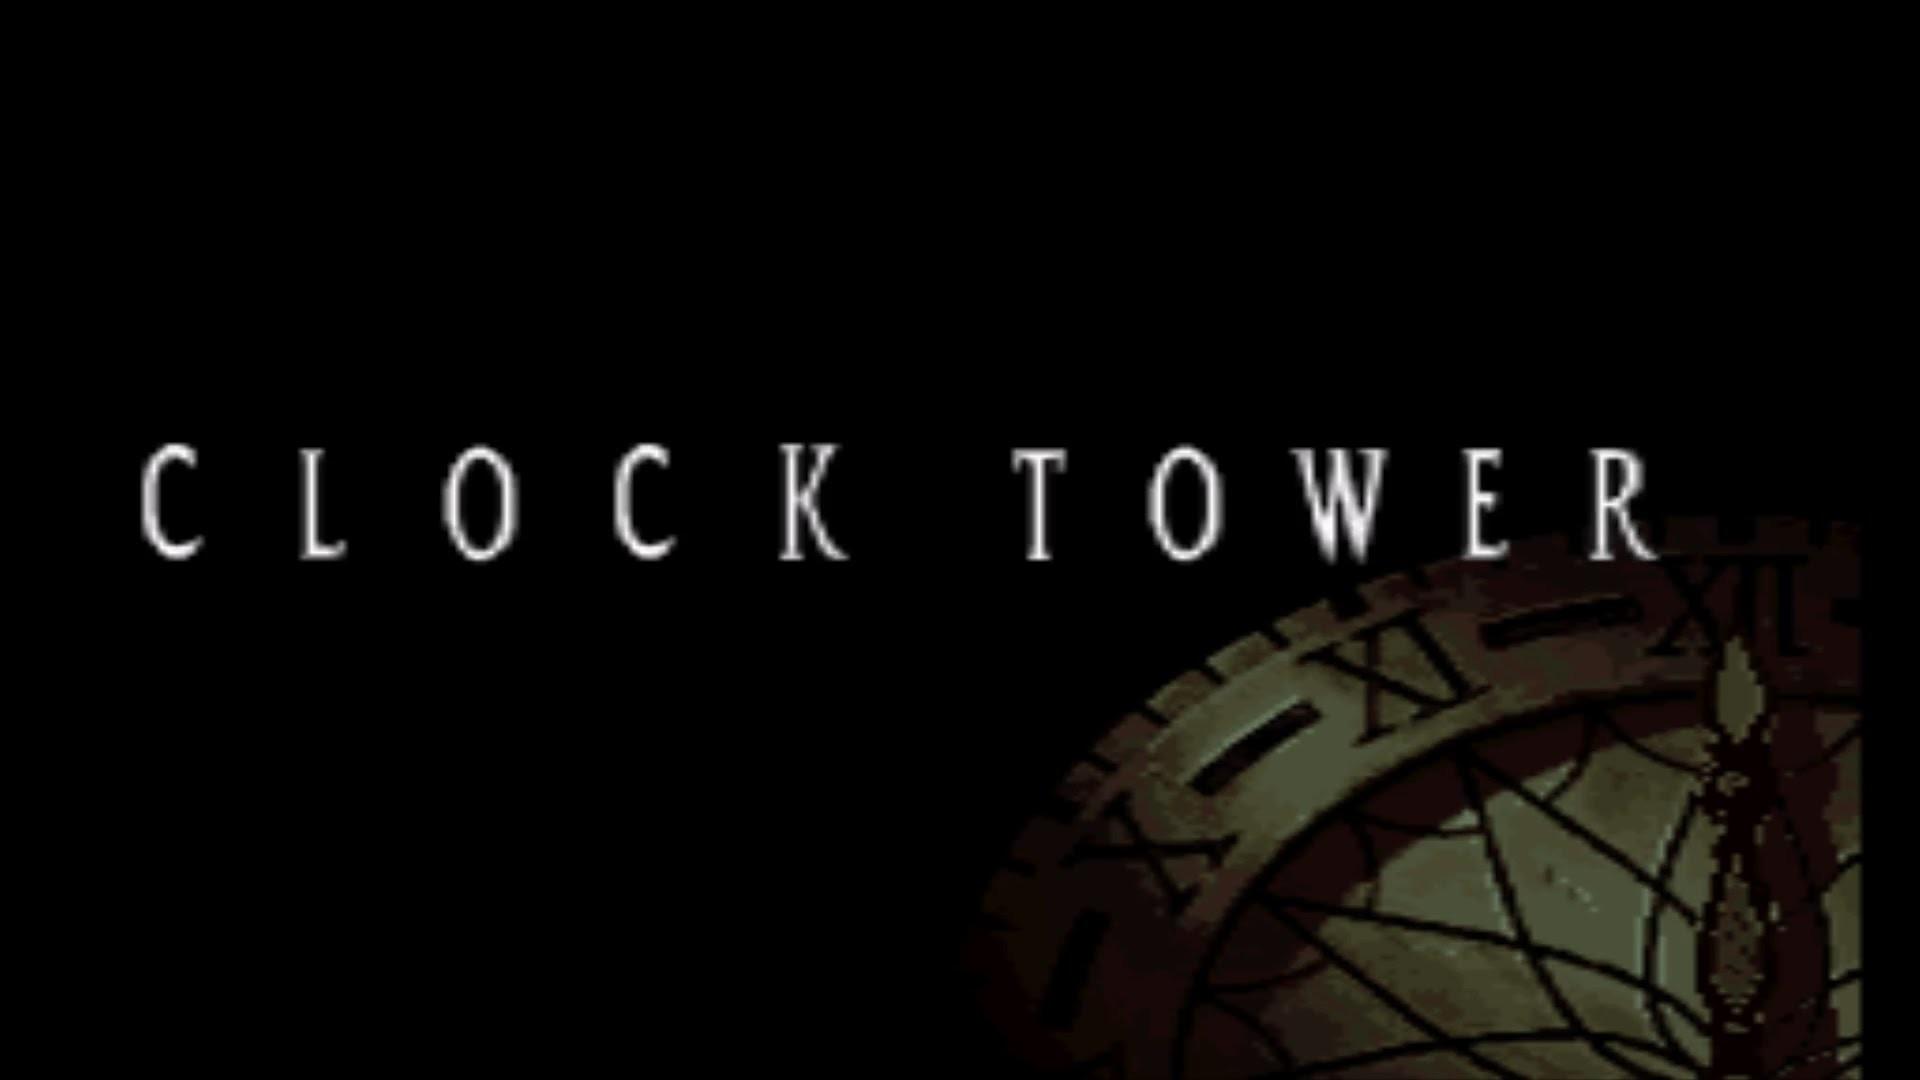 Clock Tower (SNES) gameplay (Ending H)